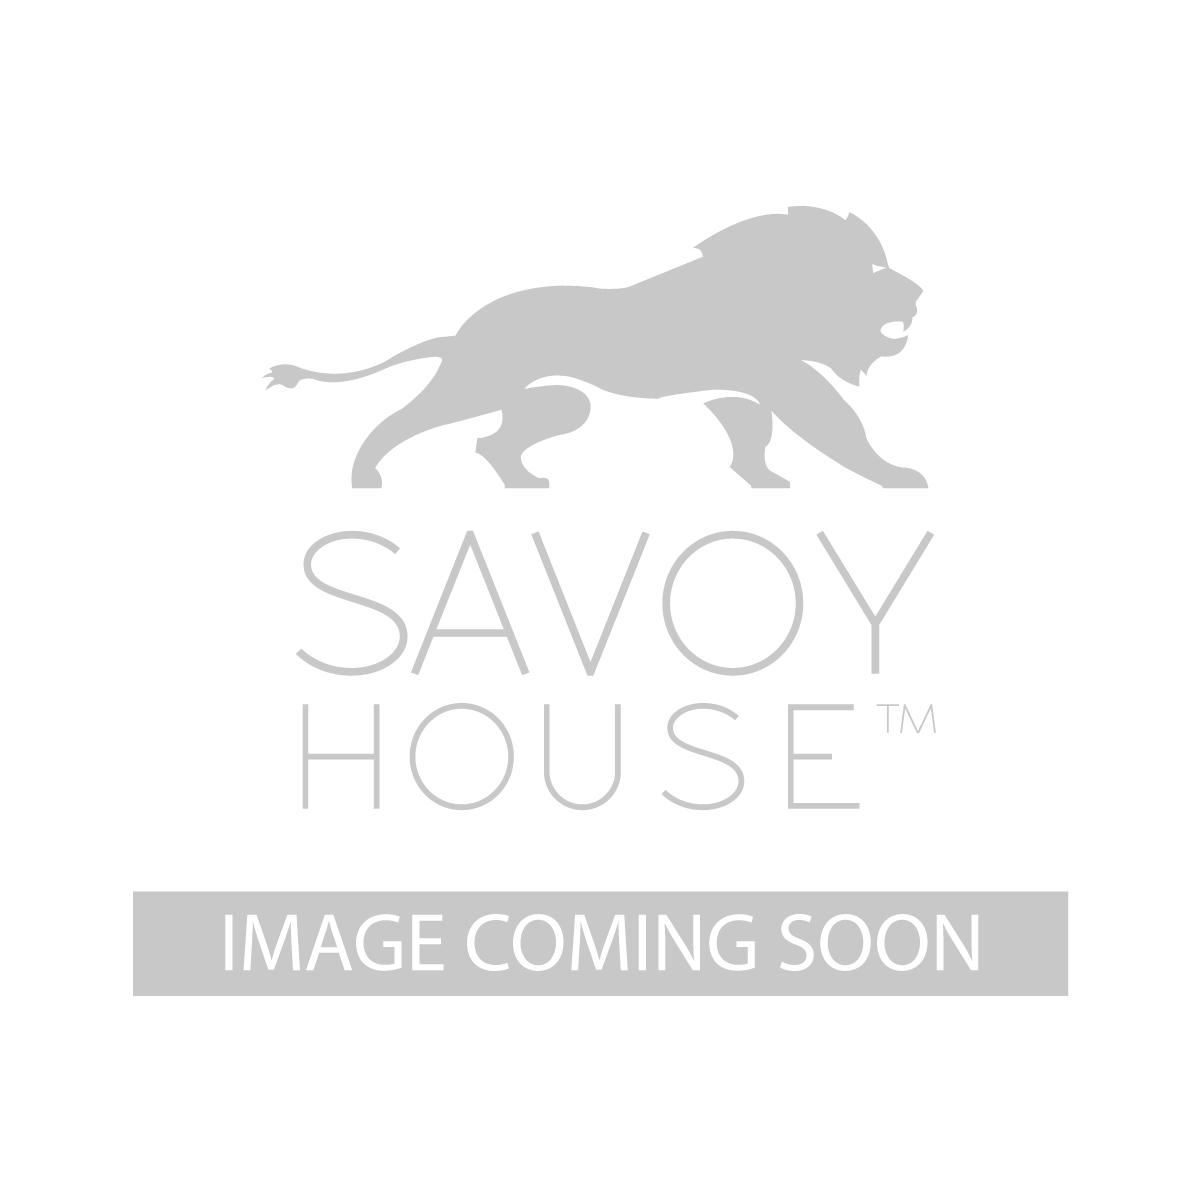 8 3405 4 73 barfield 4 light bath bar by savoy house barfield 4 light bath bar aloadofball Images